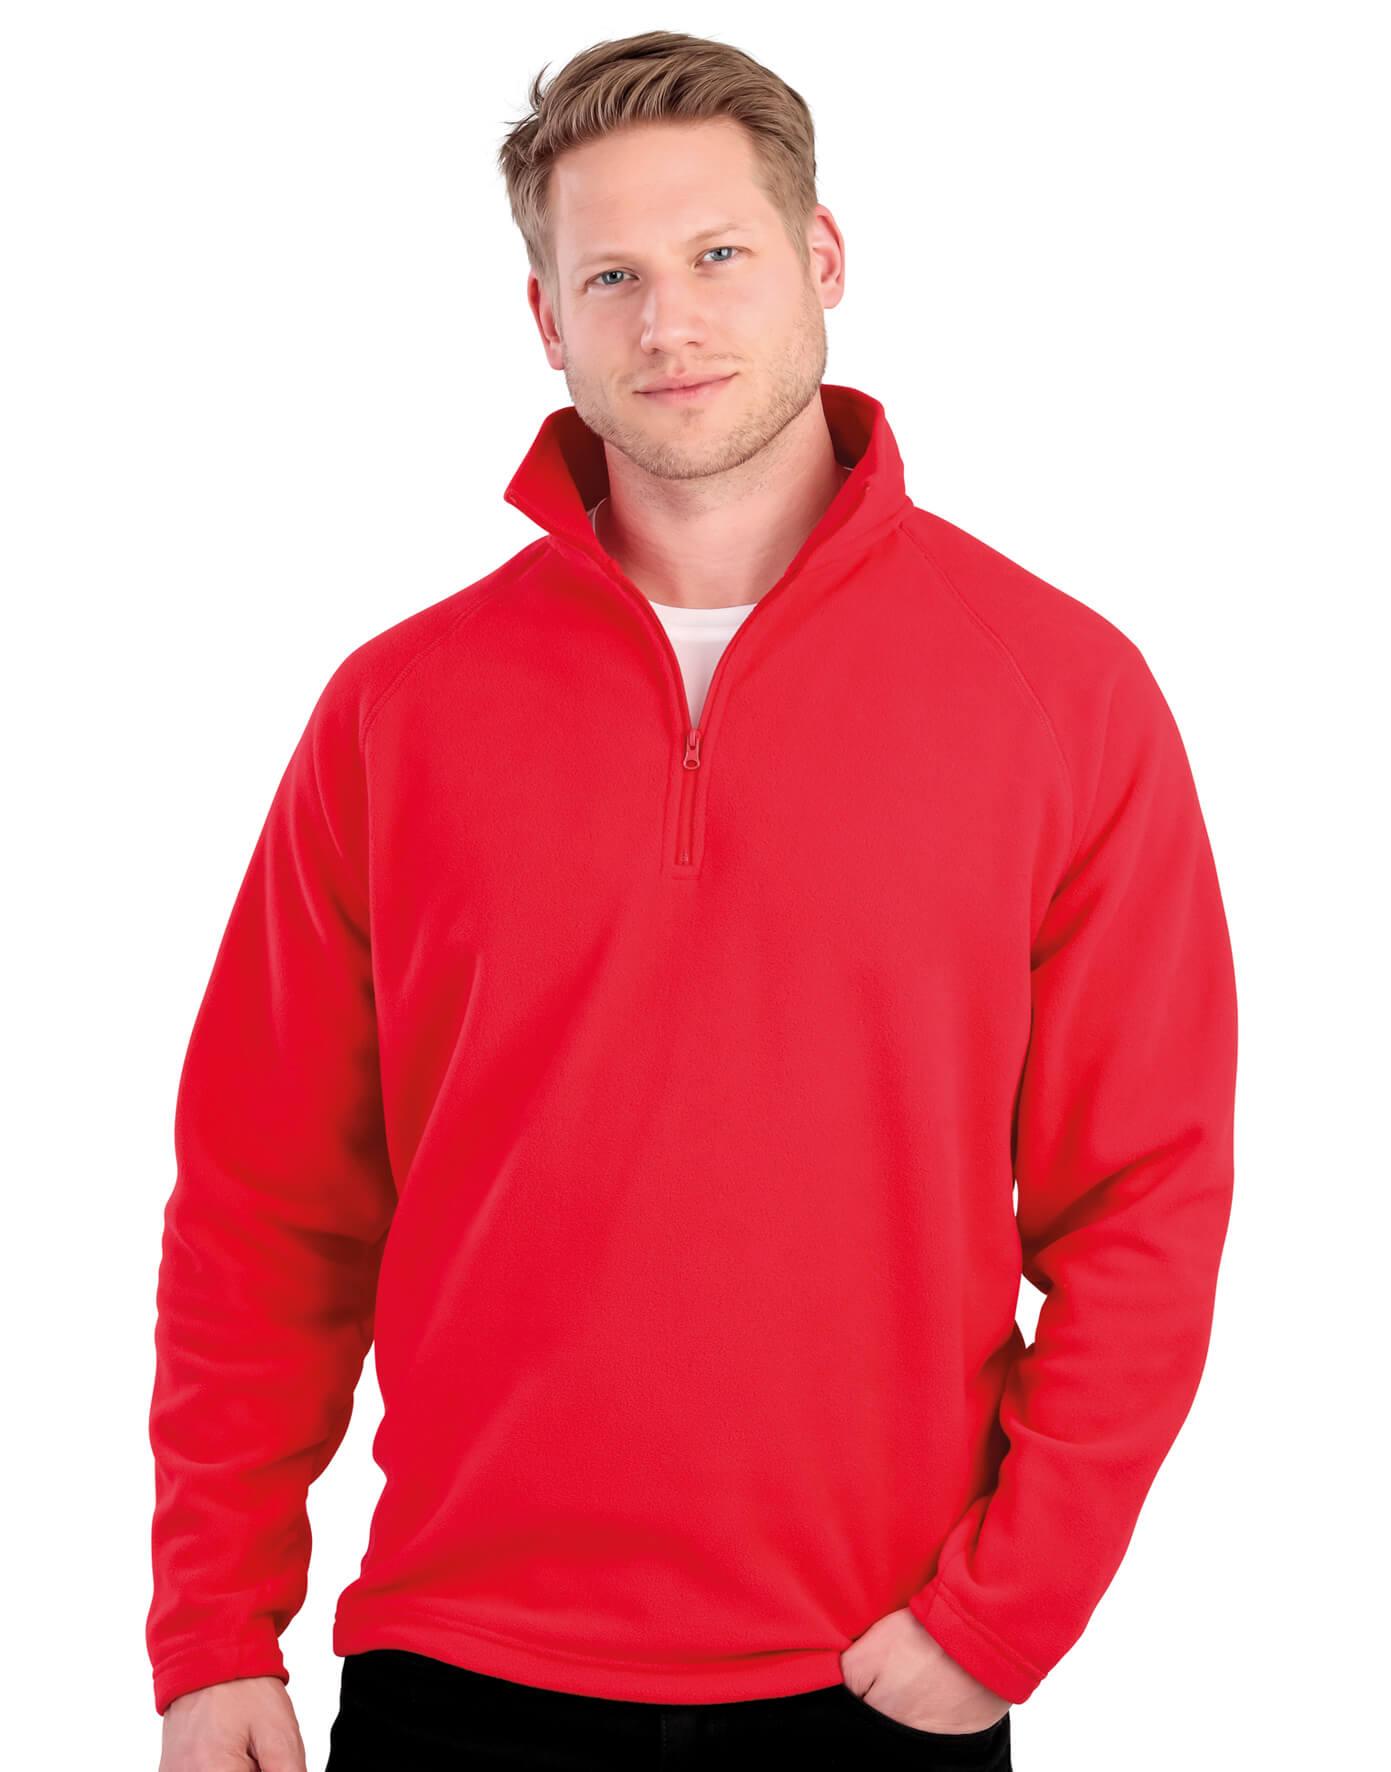 R112X Top Micron Fleece Mid Layer